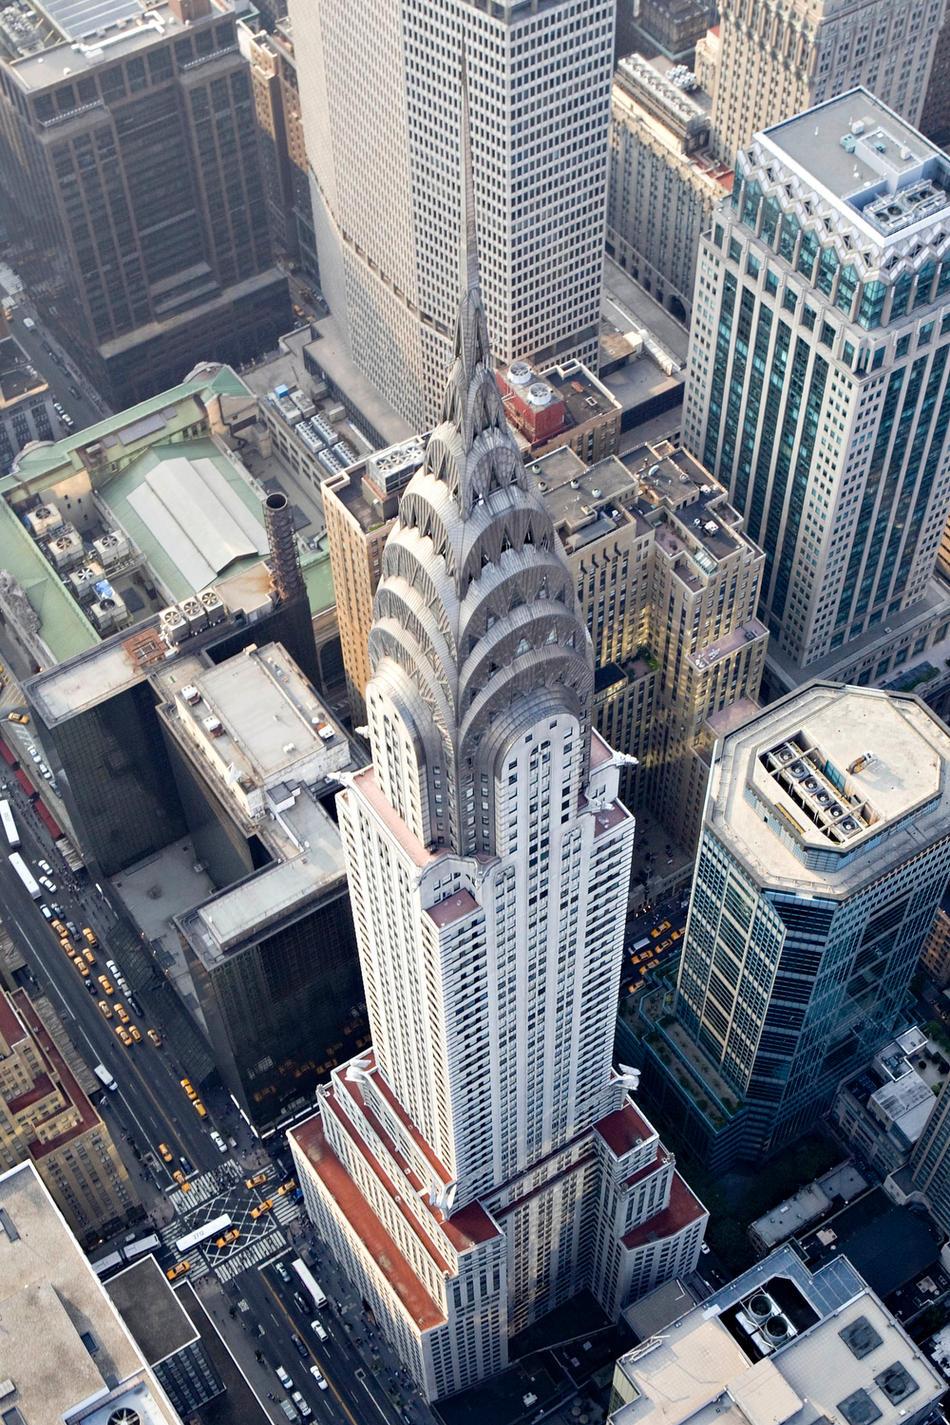 new architecture design city new york. Black Bedroom Furniture Sets. Home Design Ideas